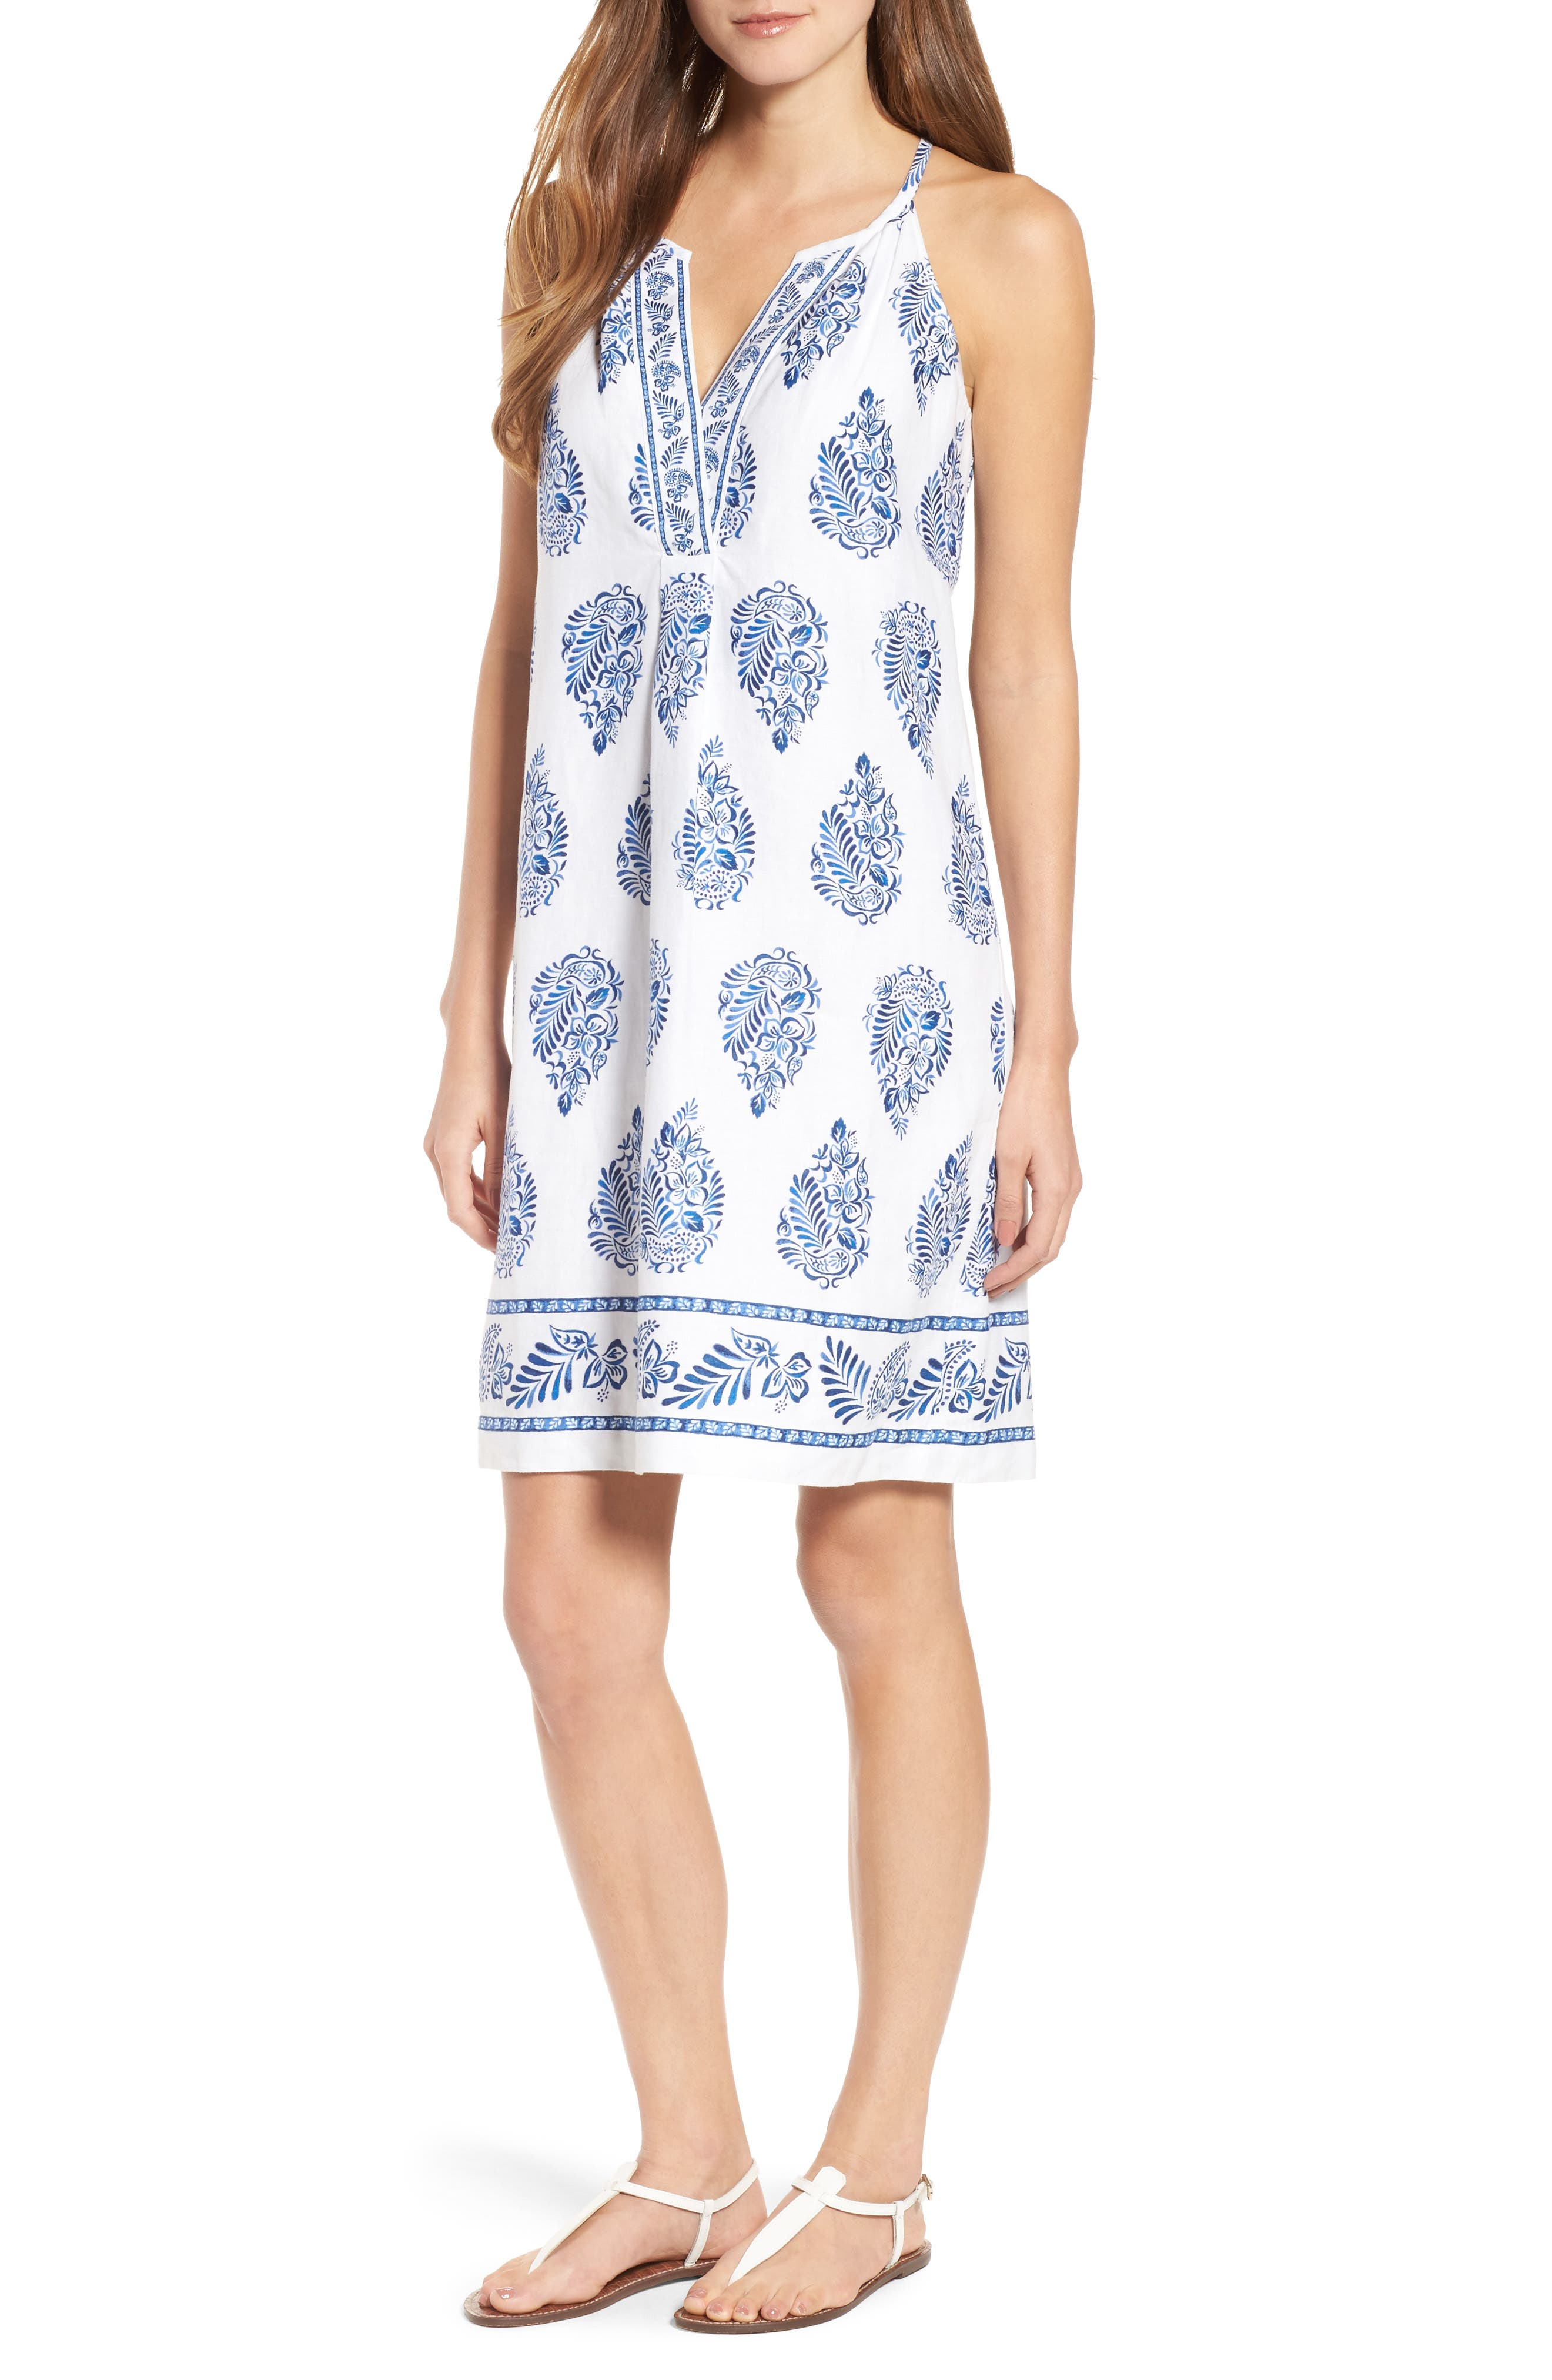 Paleys Paisley Sleeveless Shift Dress,                         Main,                         color, 401